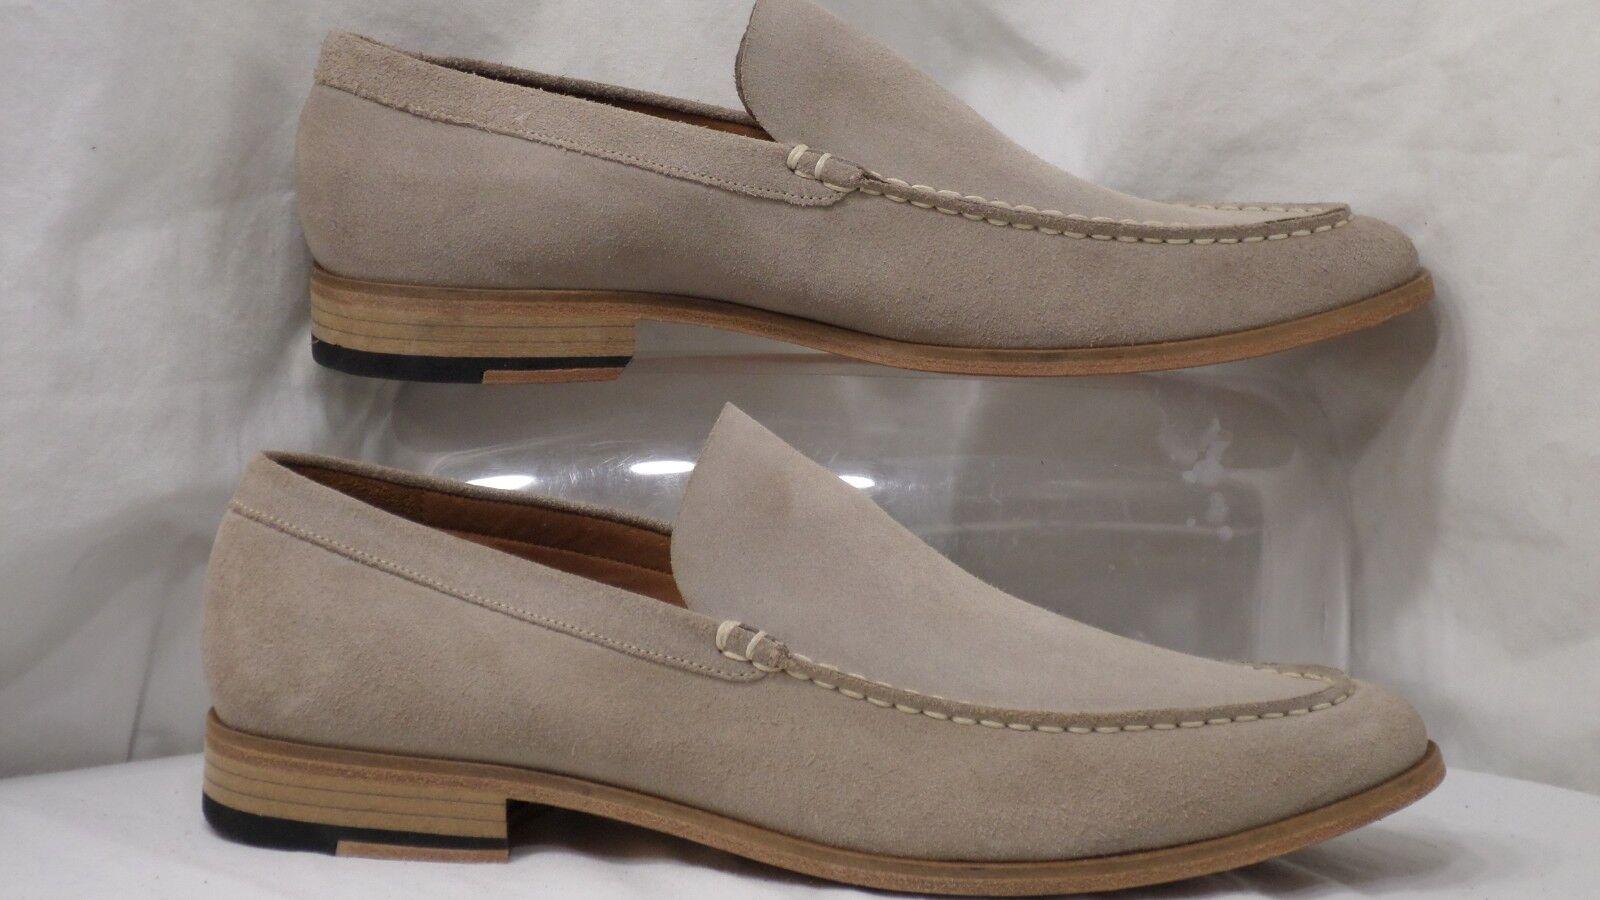 Gordon Rush 'Ashford' Beige Suede Moc-Toe Slip-On Loafer Men Size 11 M